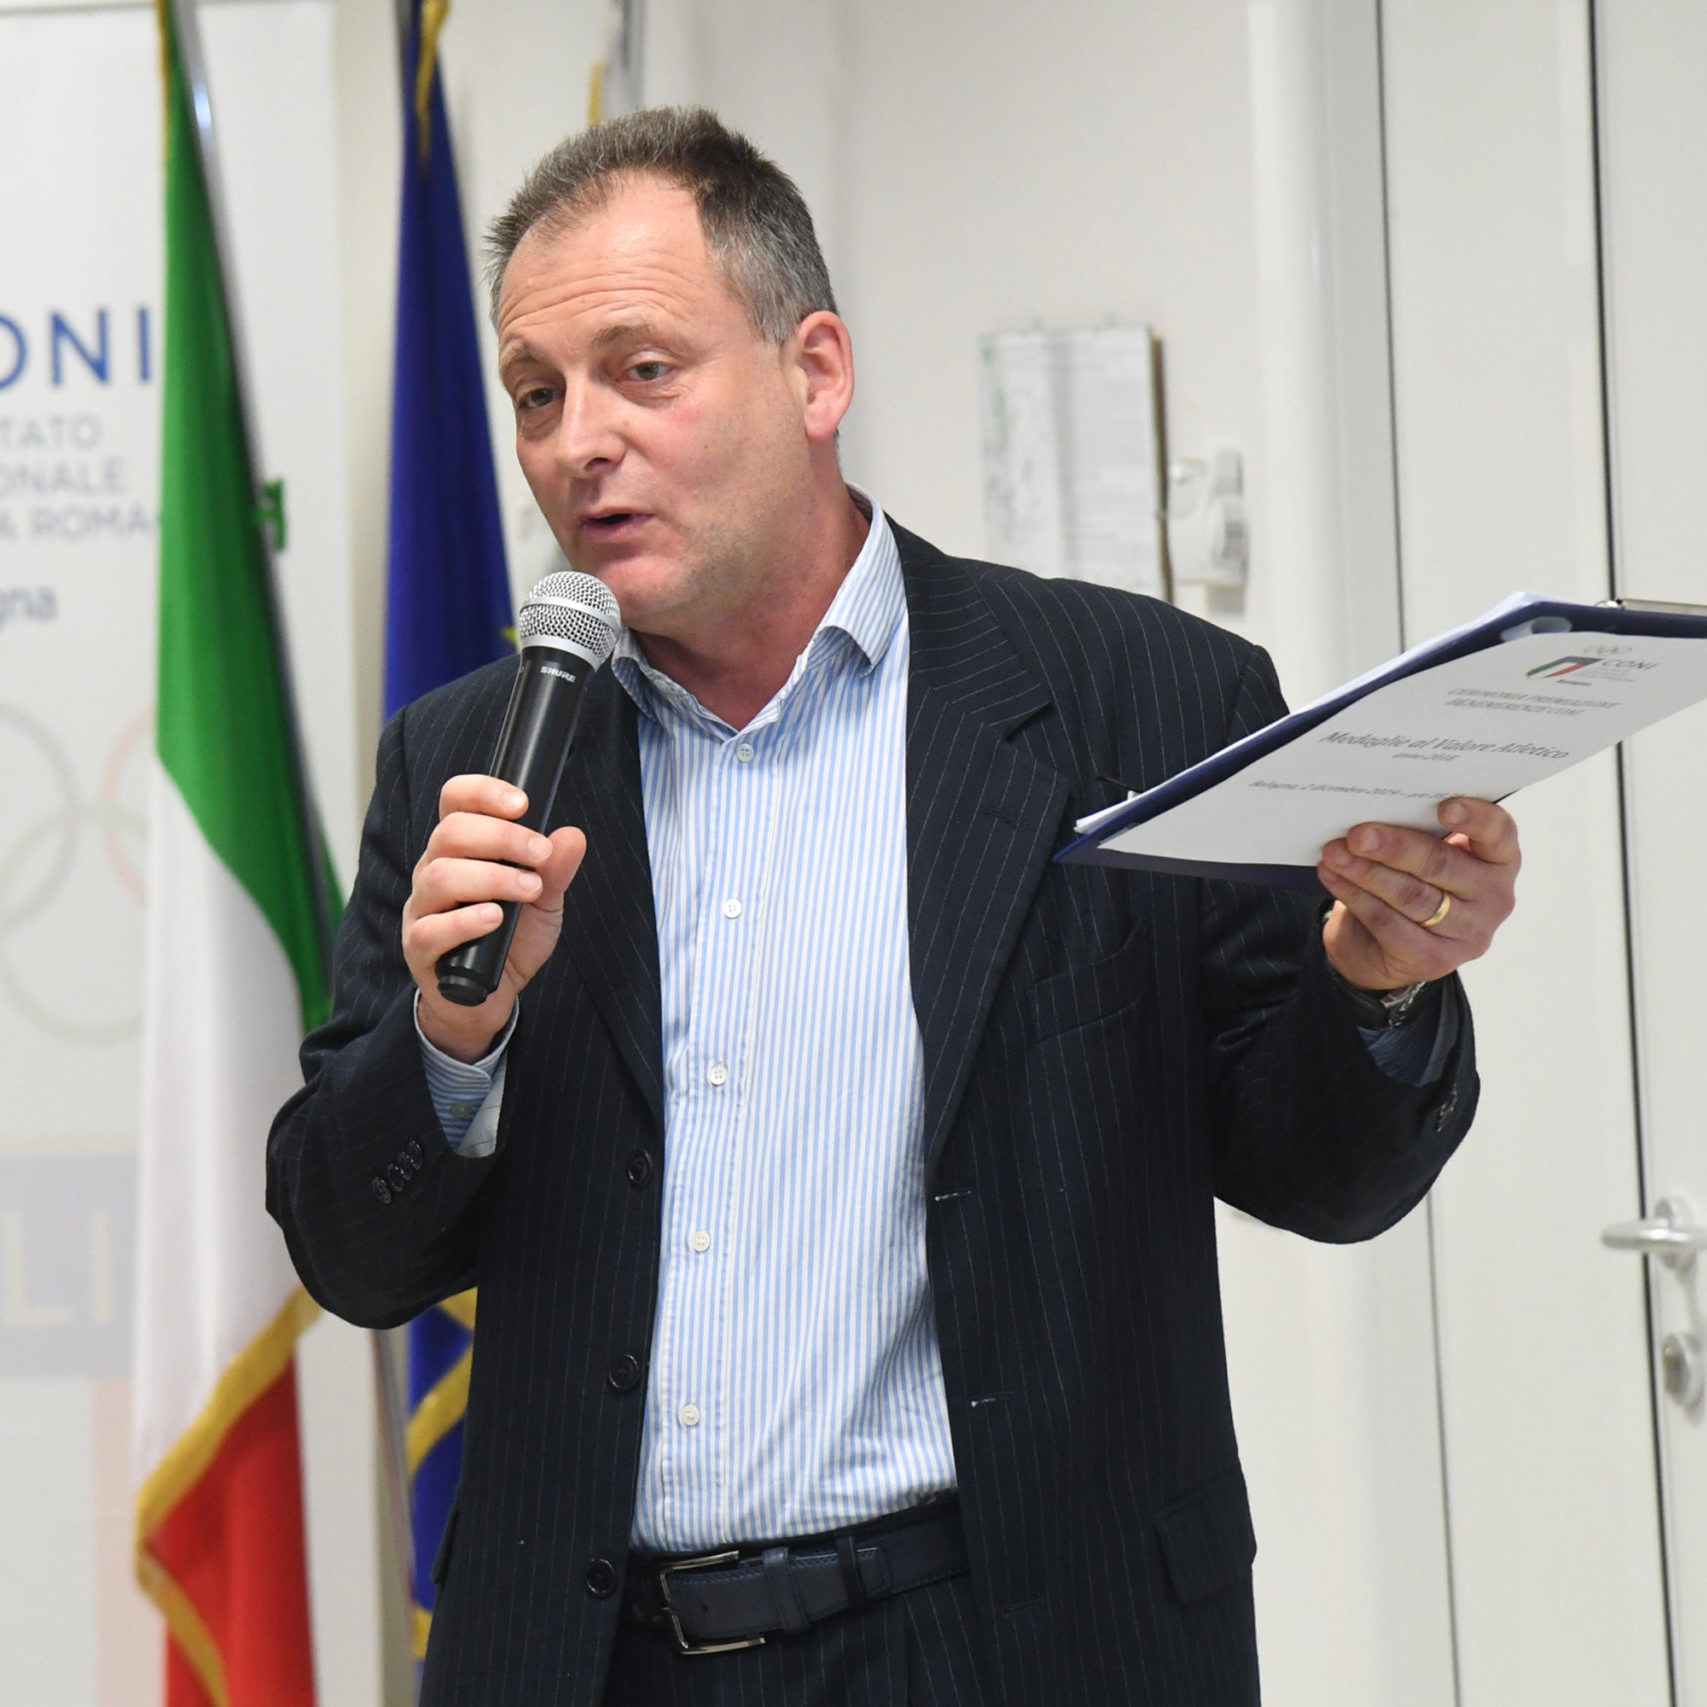 Matteo Fogacci